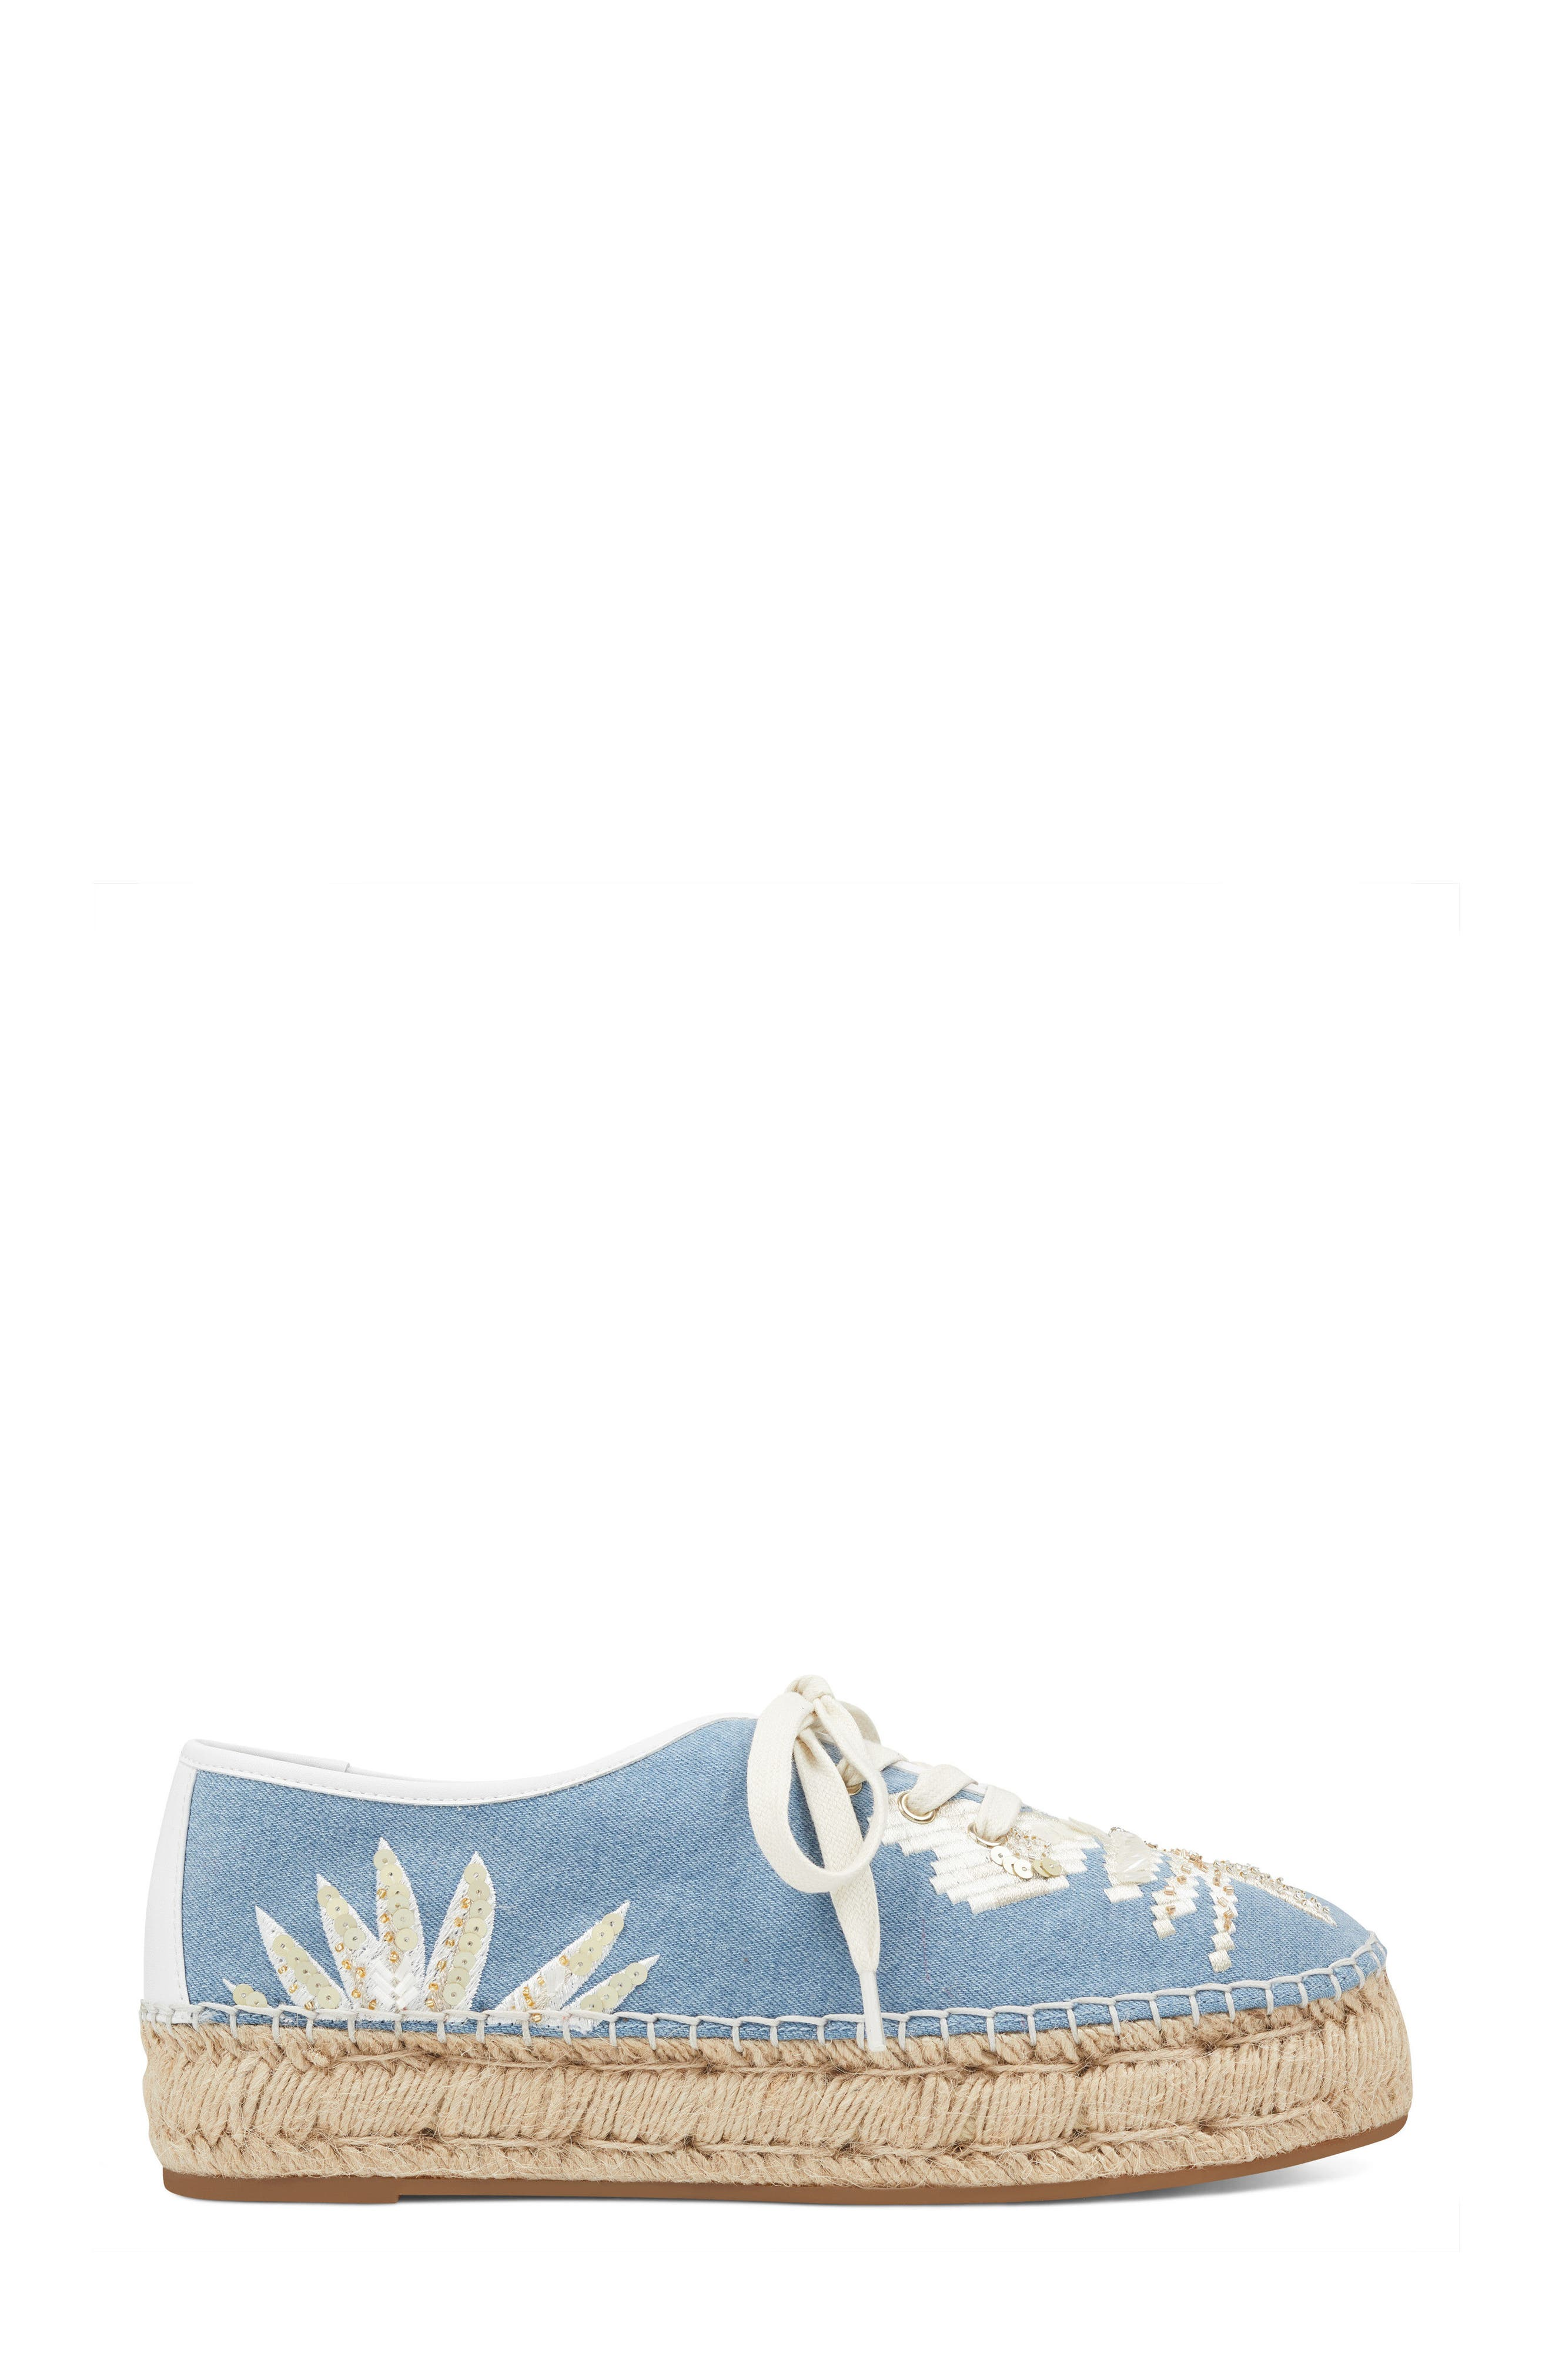 Guinup Embellished Espadrille Sneaker,                             Alternate thumbnail 3, color,                             Light Blue/ White Denim